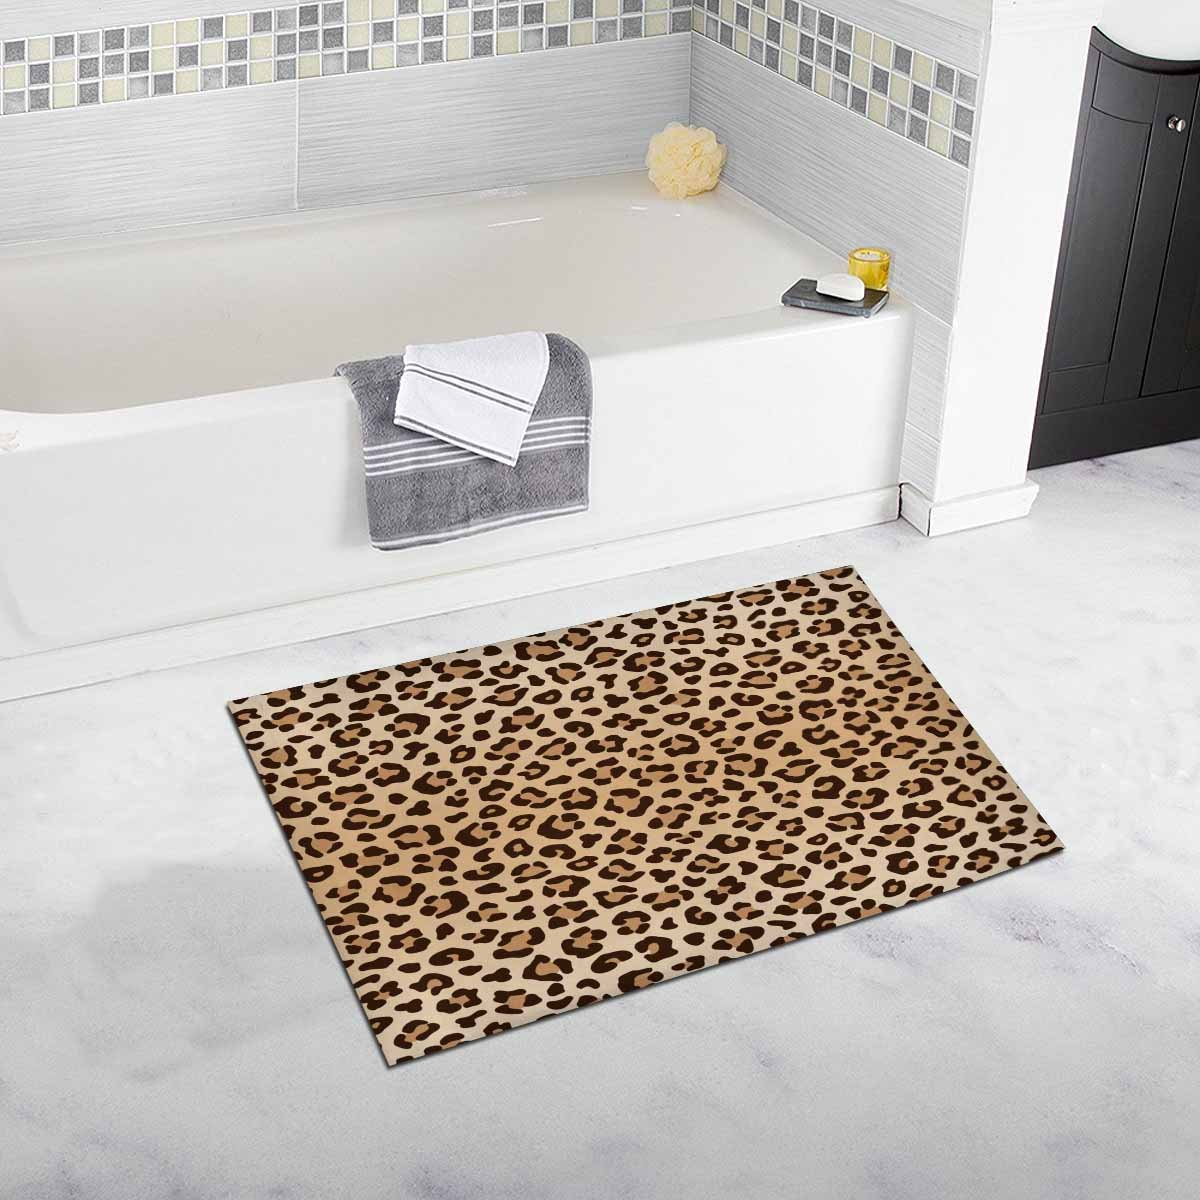 InterestPrint Leopard Animal Print Non Slip Bathroom Mat Bath Rug, 20 W X 32 L Inches